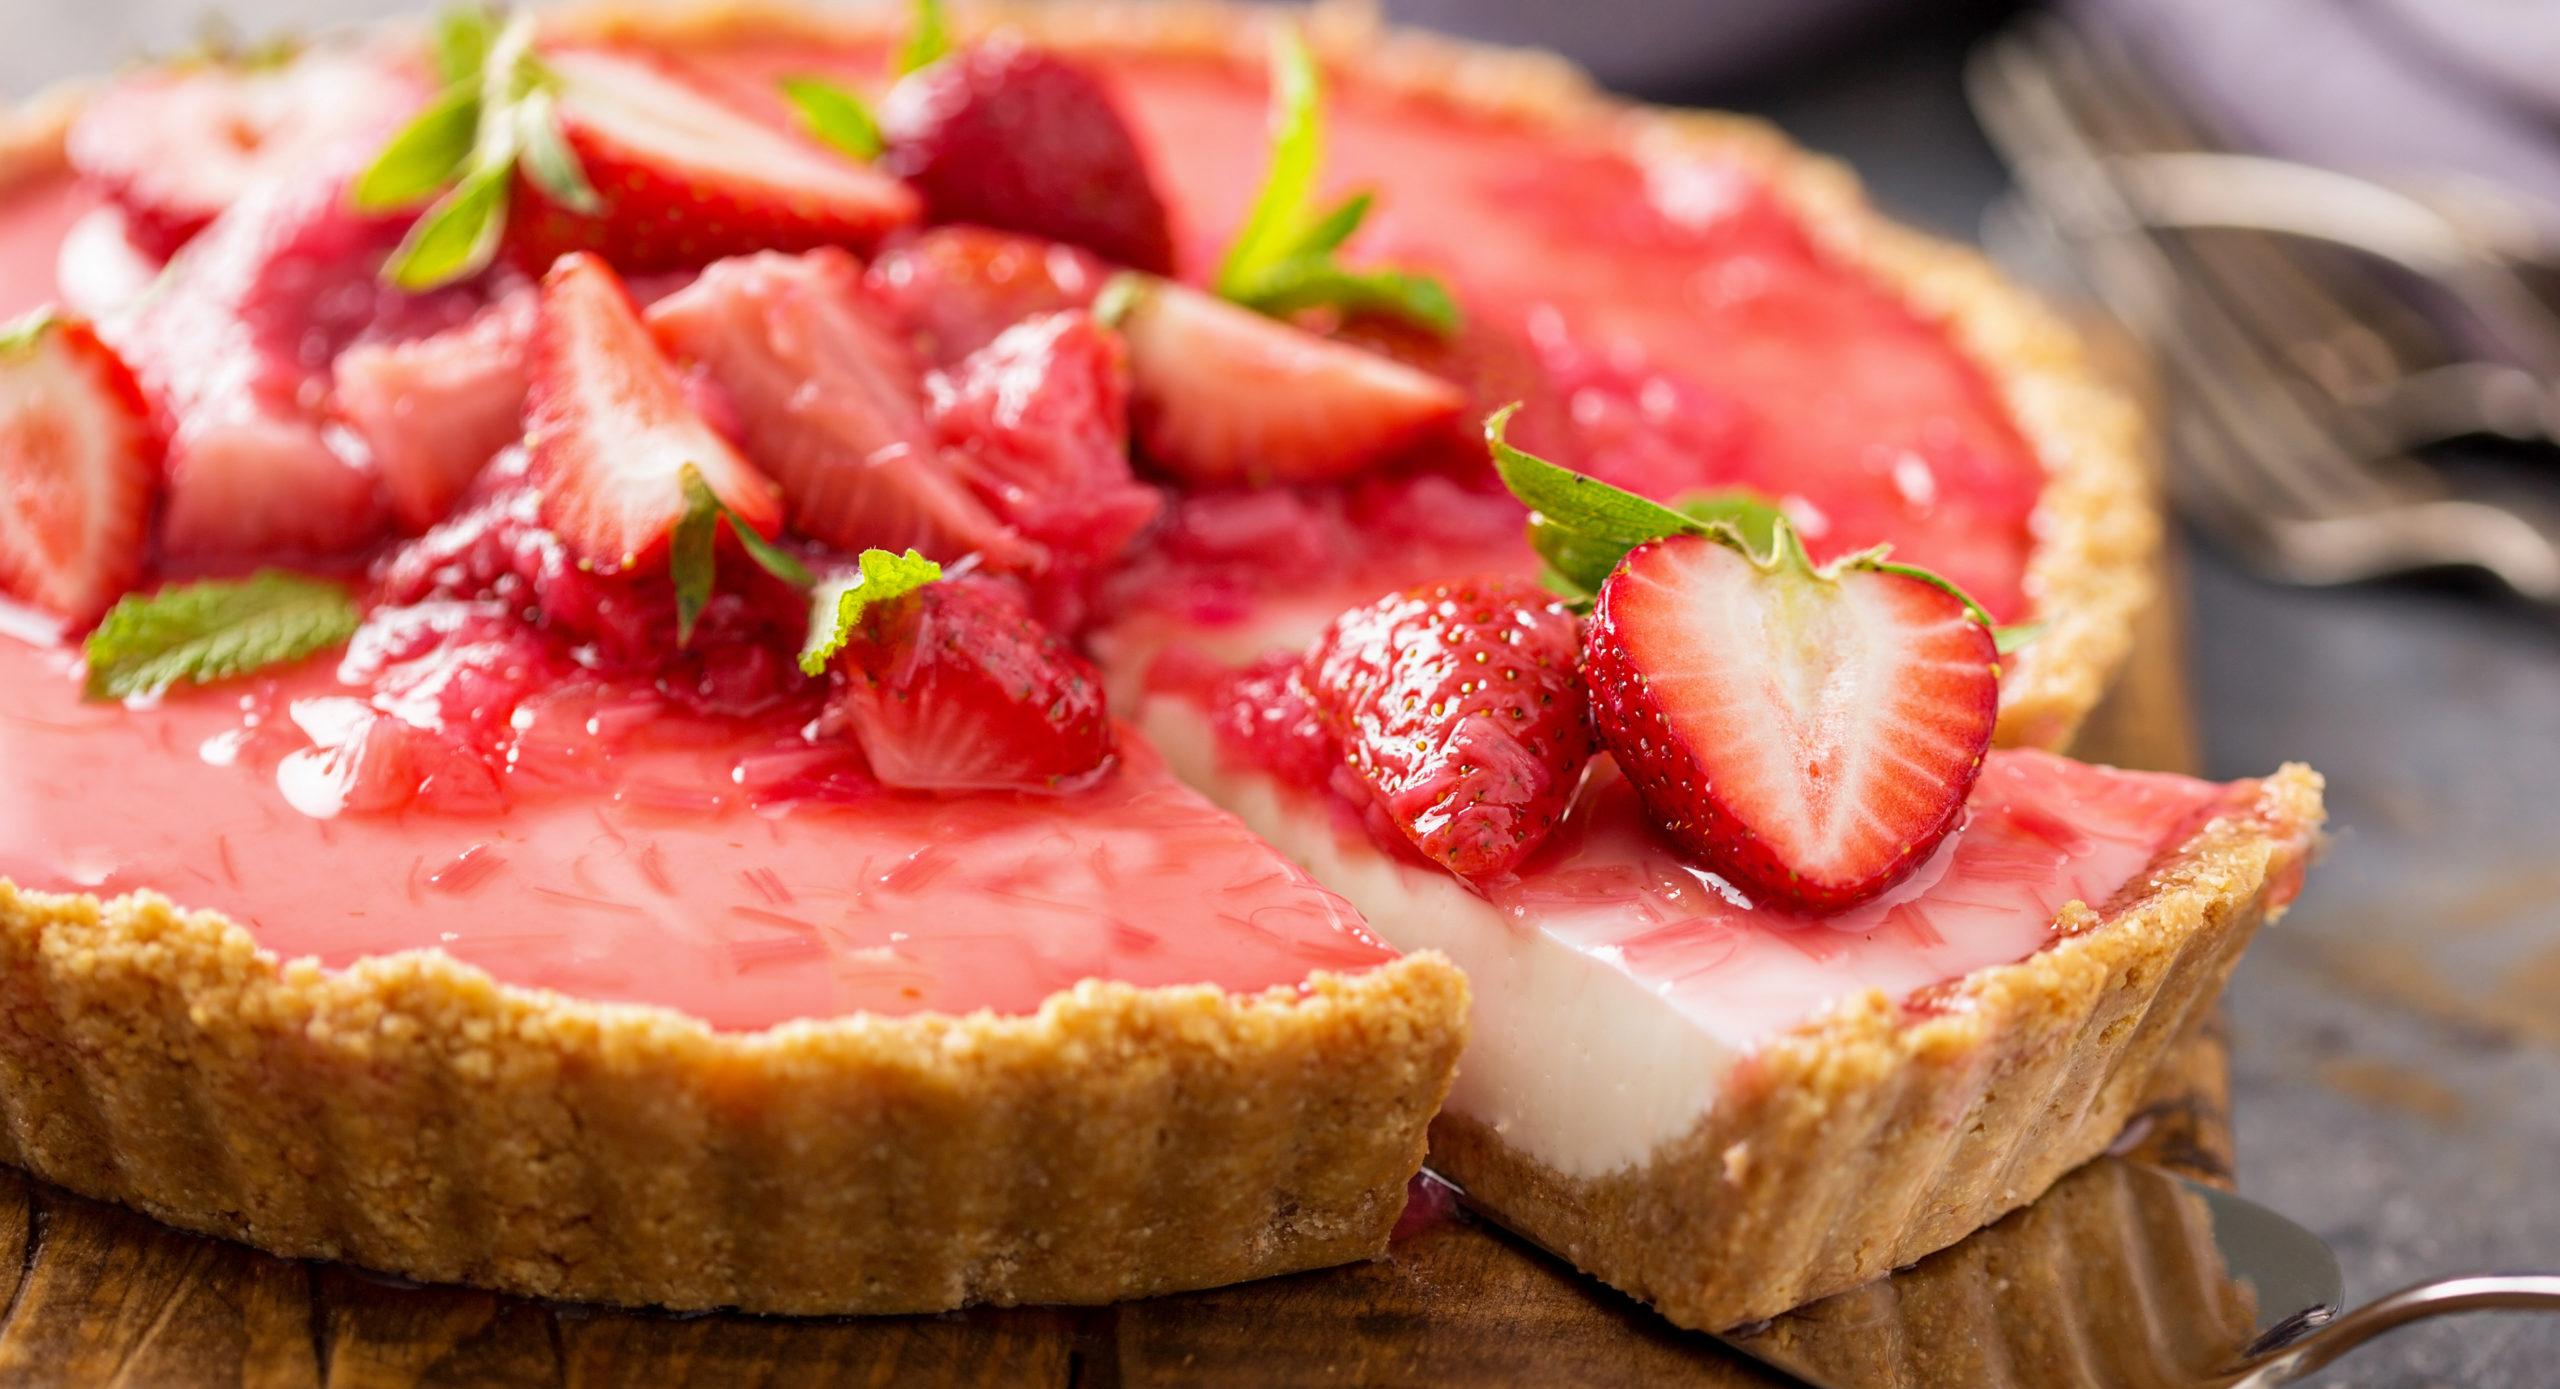 keto strawberry rhubarb cheesecake sliced and ready to serve